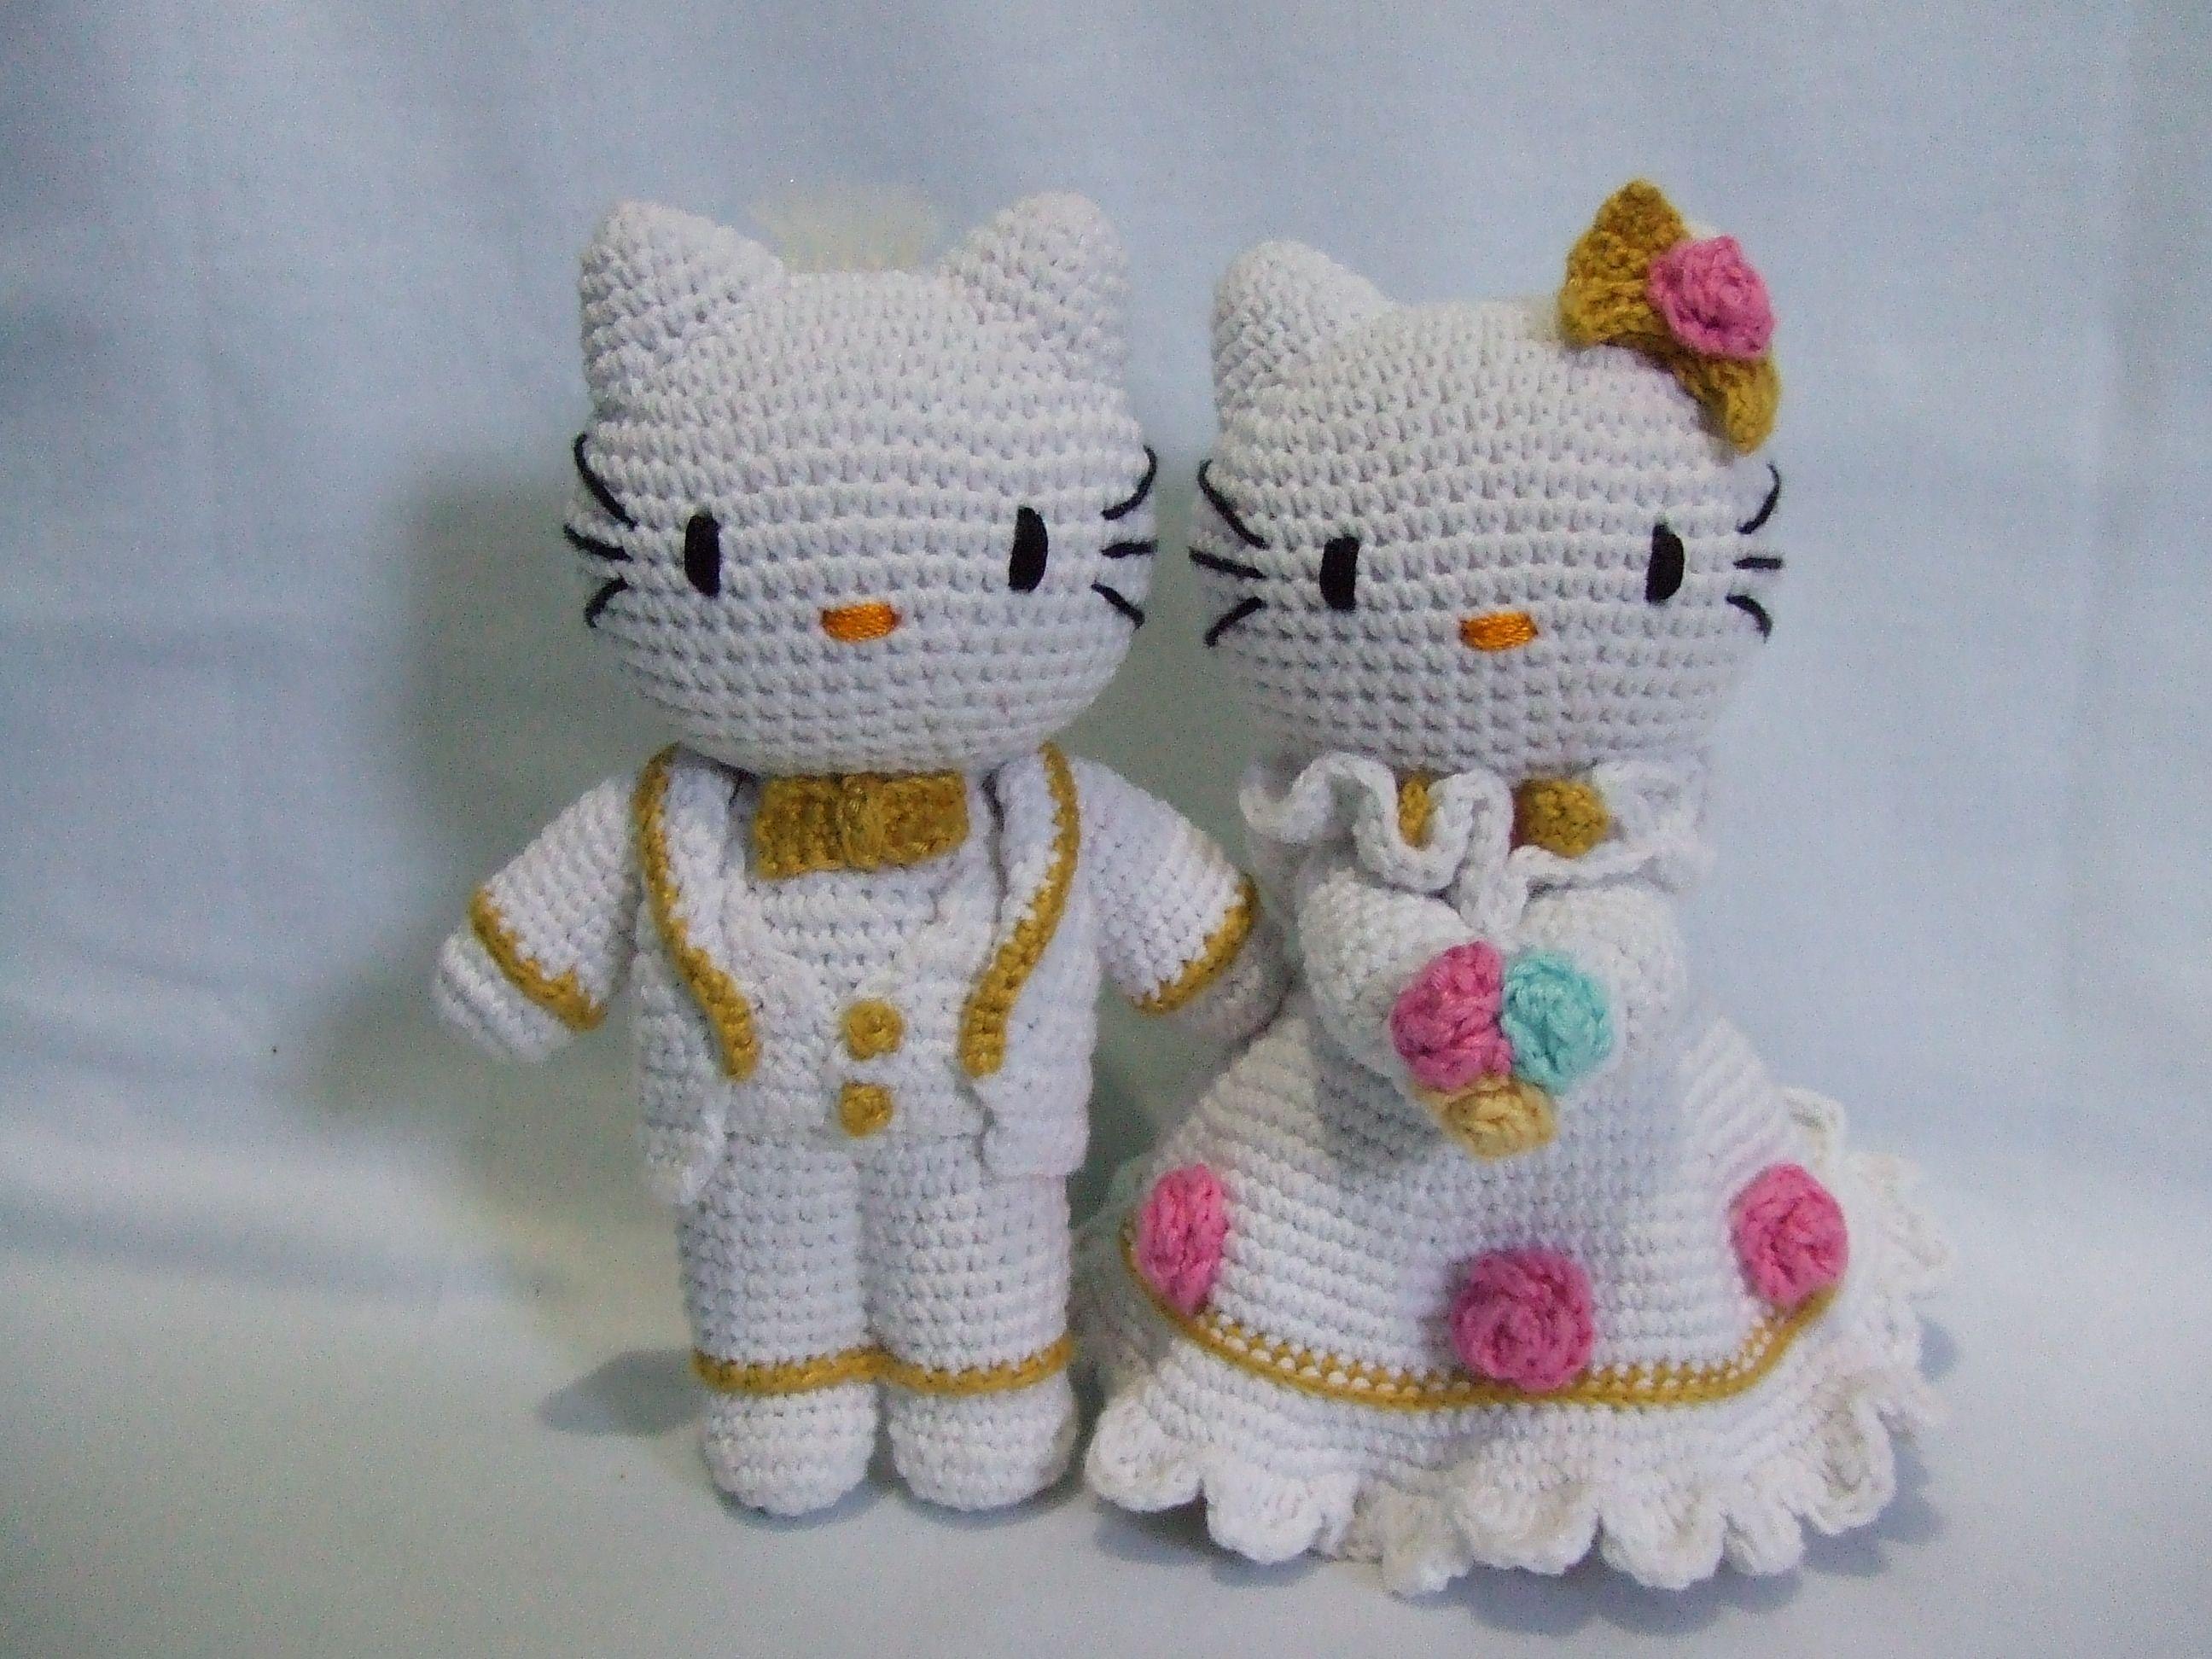 a42606aaba55c88e61f9f382d4ad5c14.jpg (2592×1944)   Virka hello kitty ...